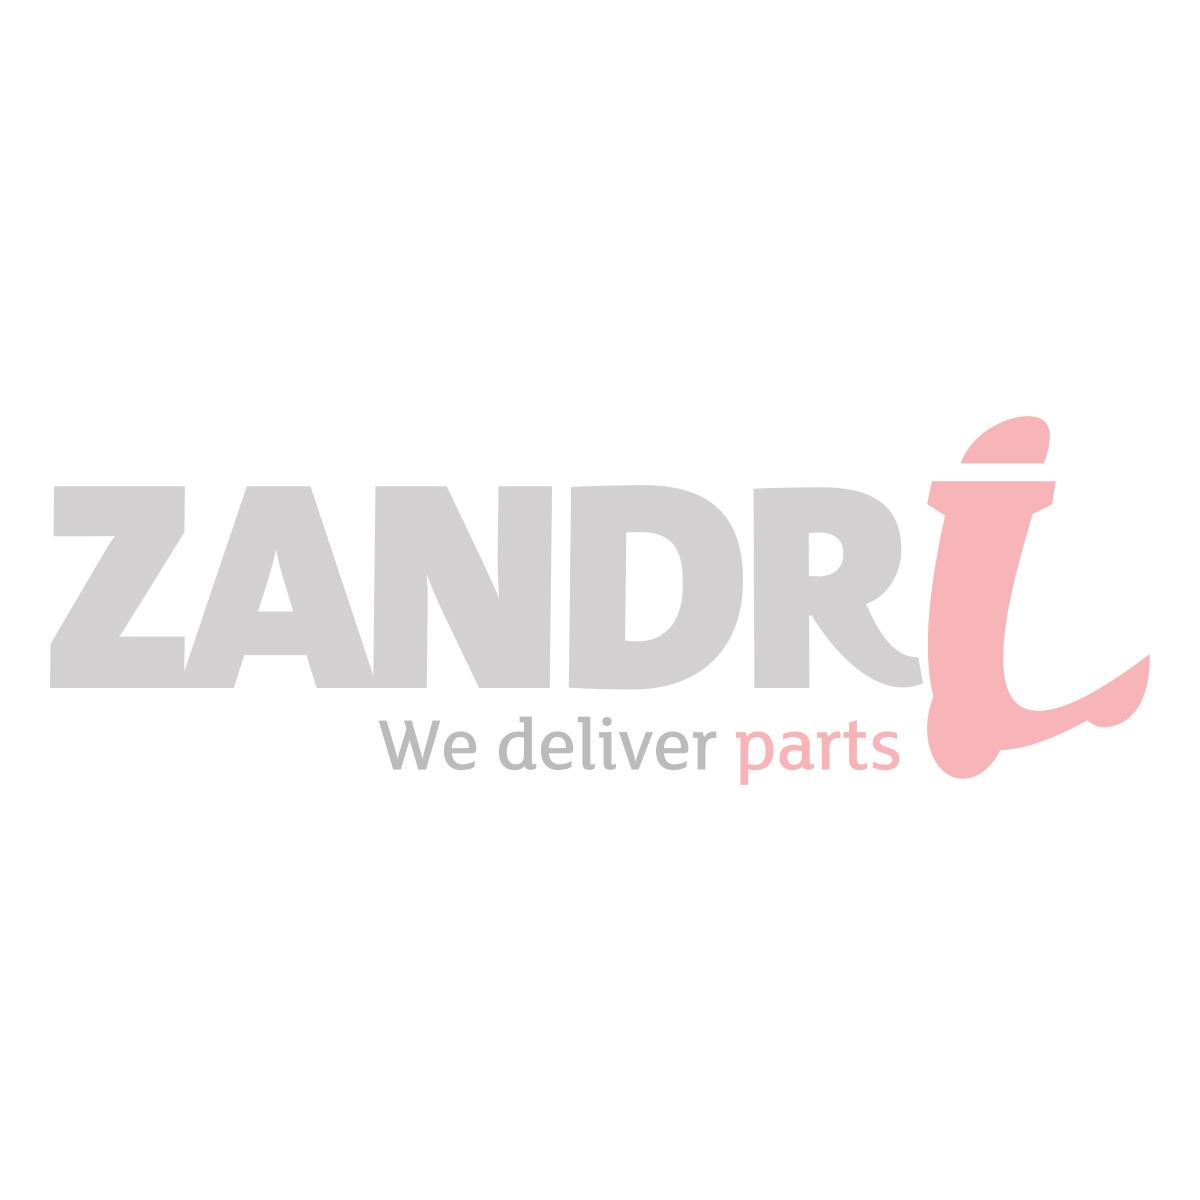 Zuiger Honda Bali / SFX / Kymco Dink / DJ / KB-k12 / TB / X8R 39mm Vertex